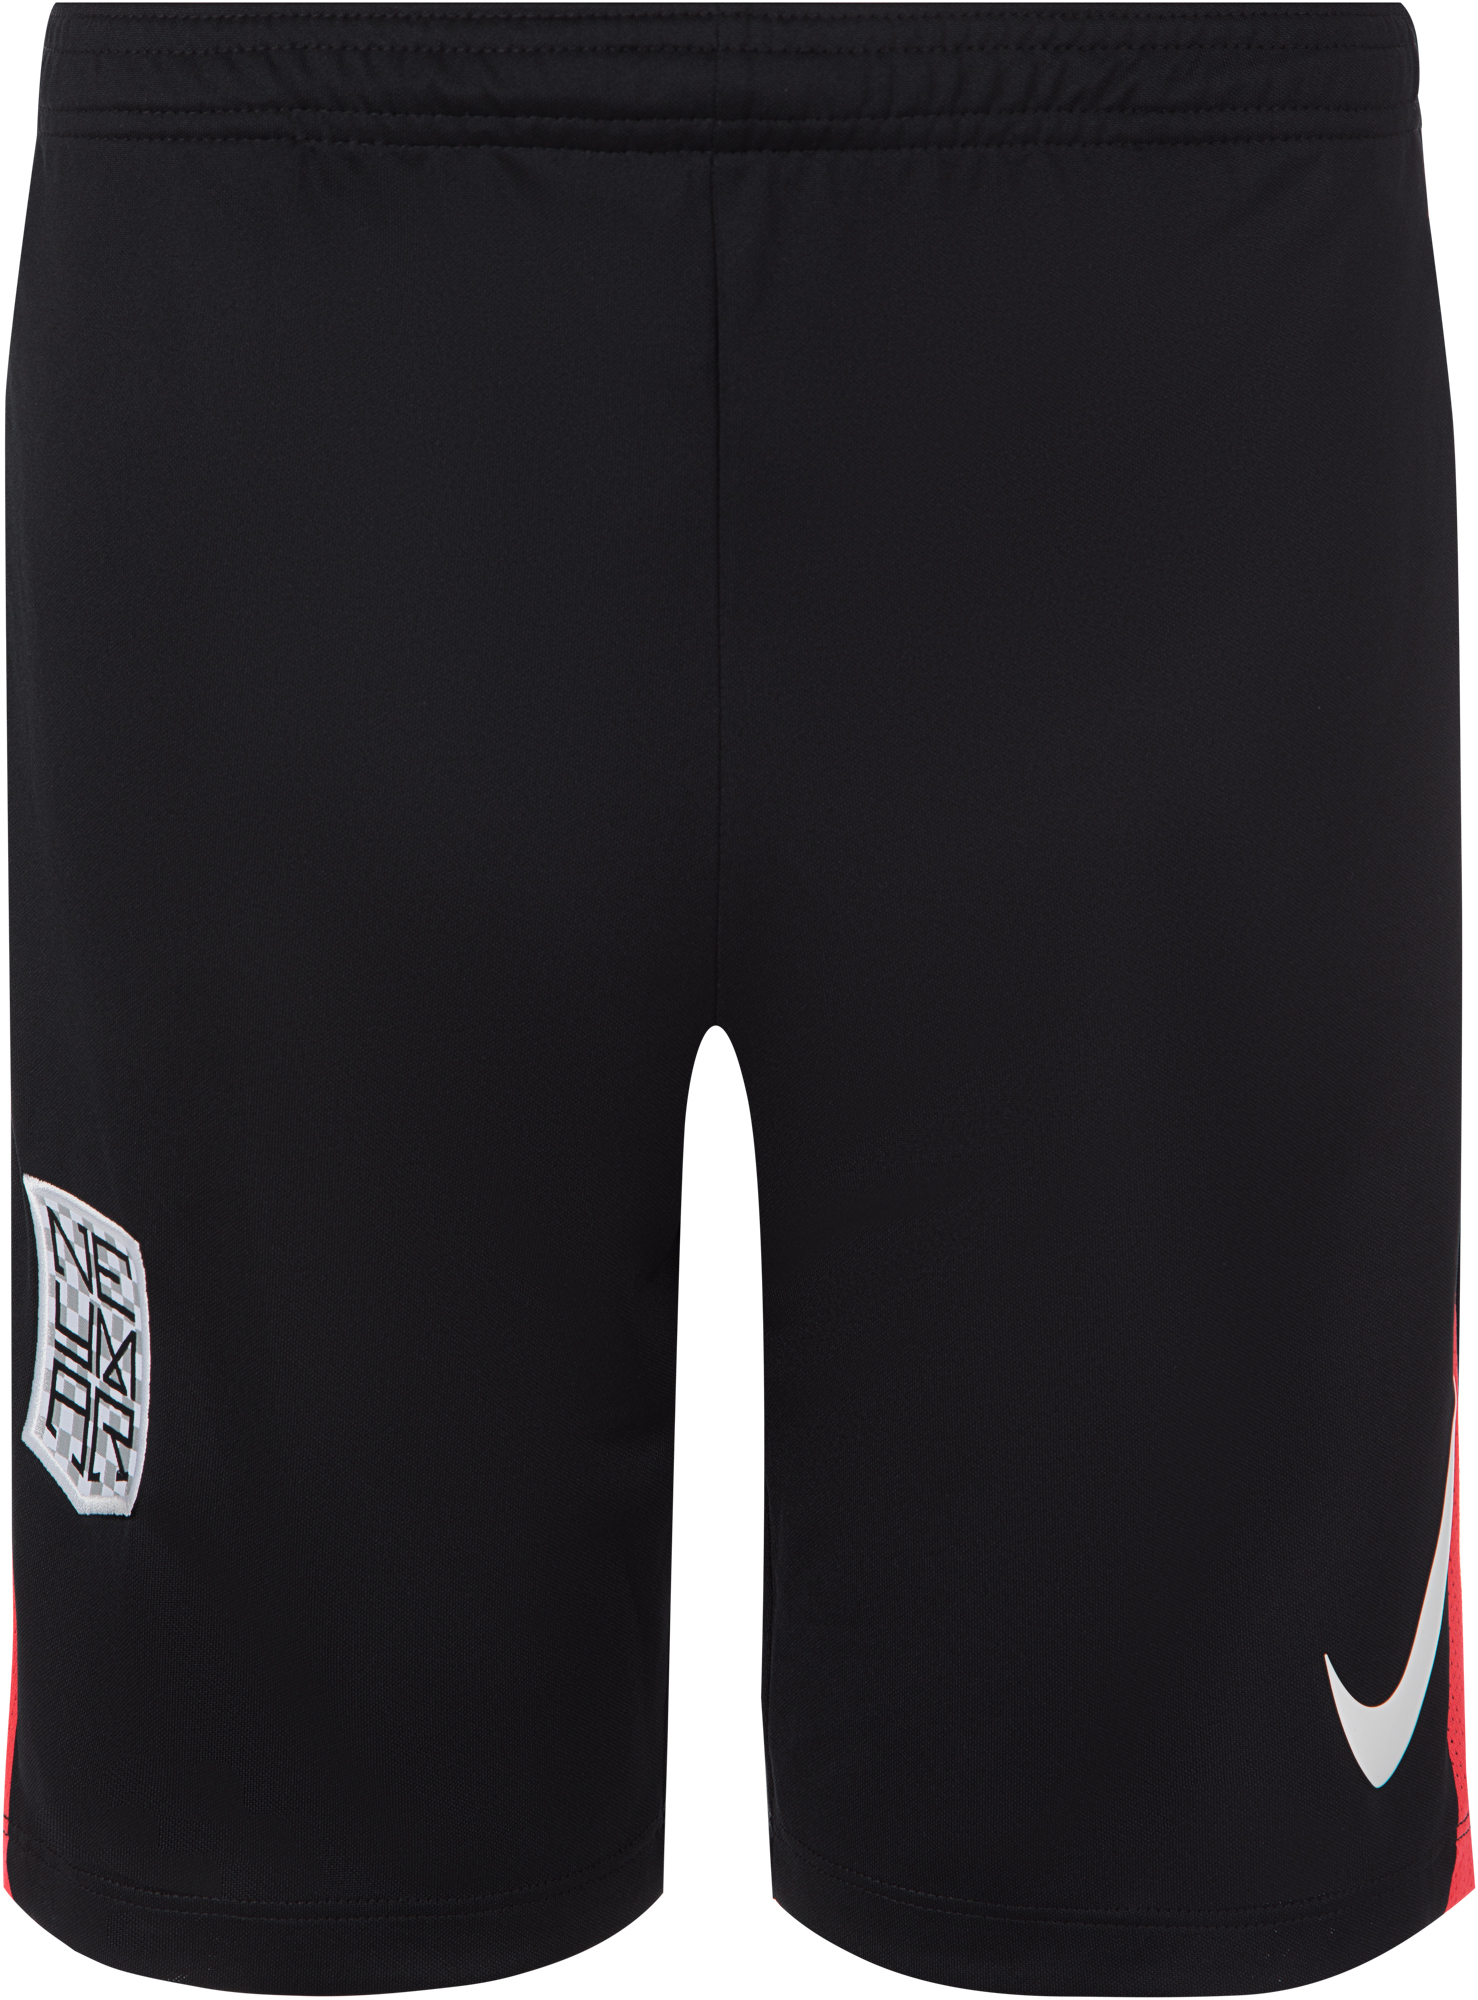 Nike Шорты для мальчиков Neymar Jr. Dry, размер 158-170